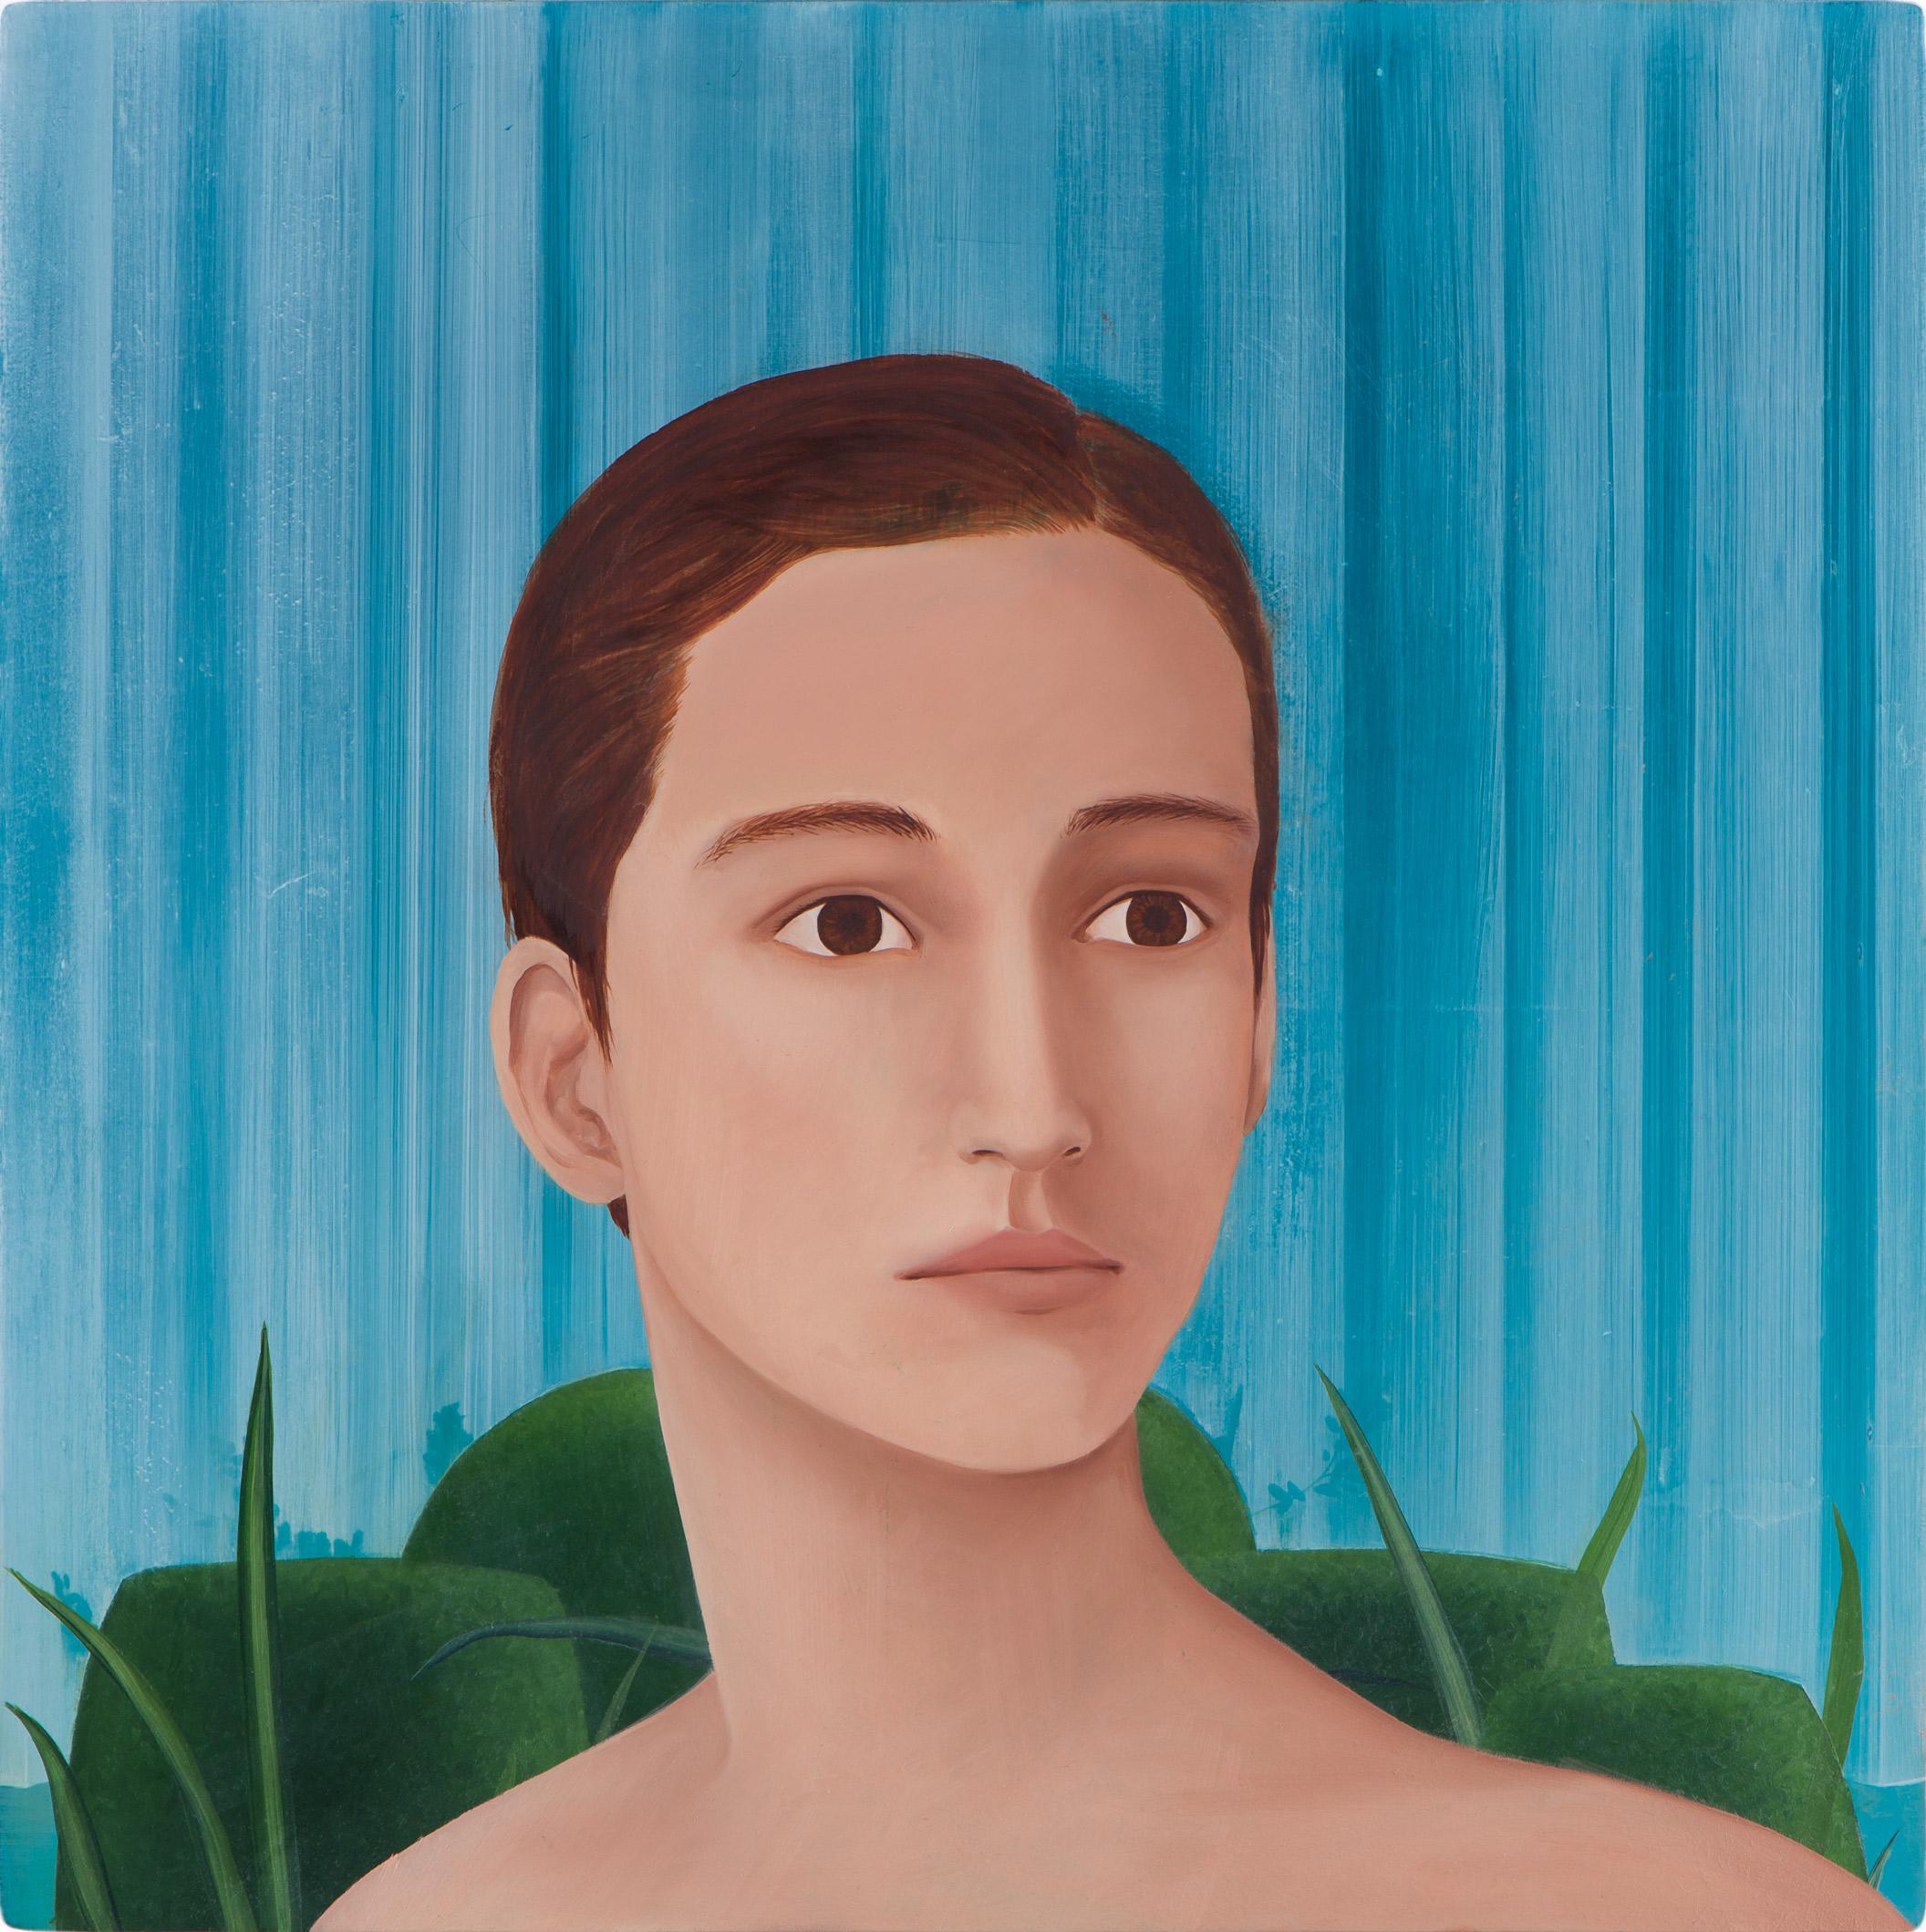 Untitled/40 x 40 cm, Oil on wood/2019